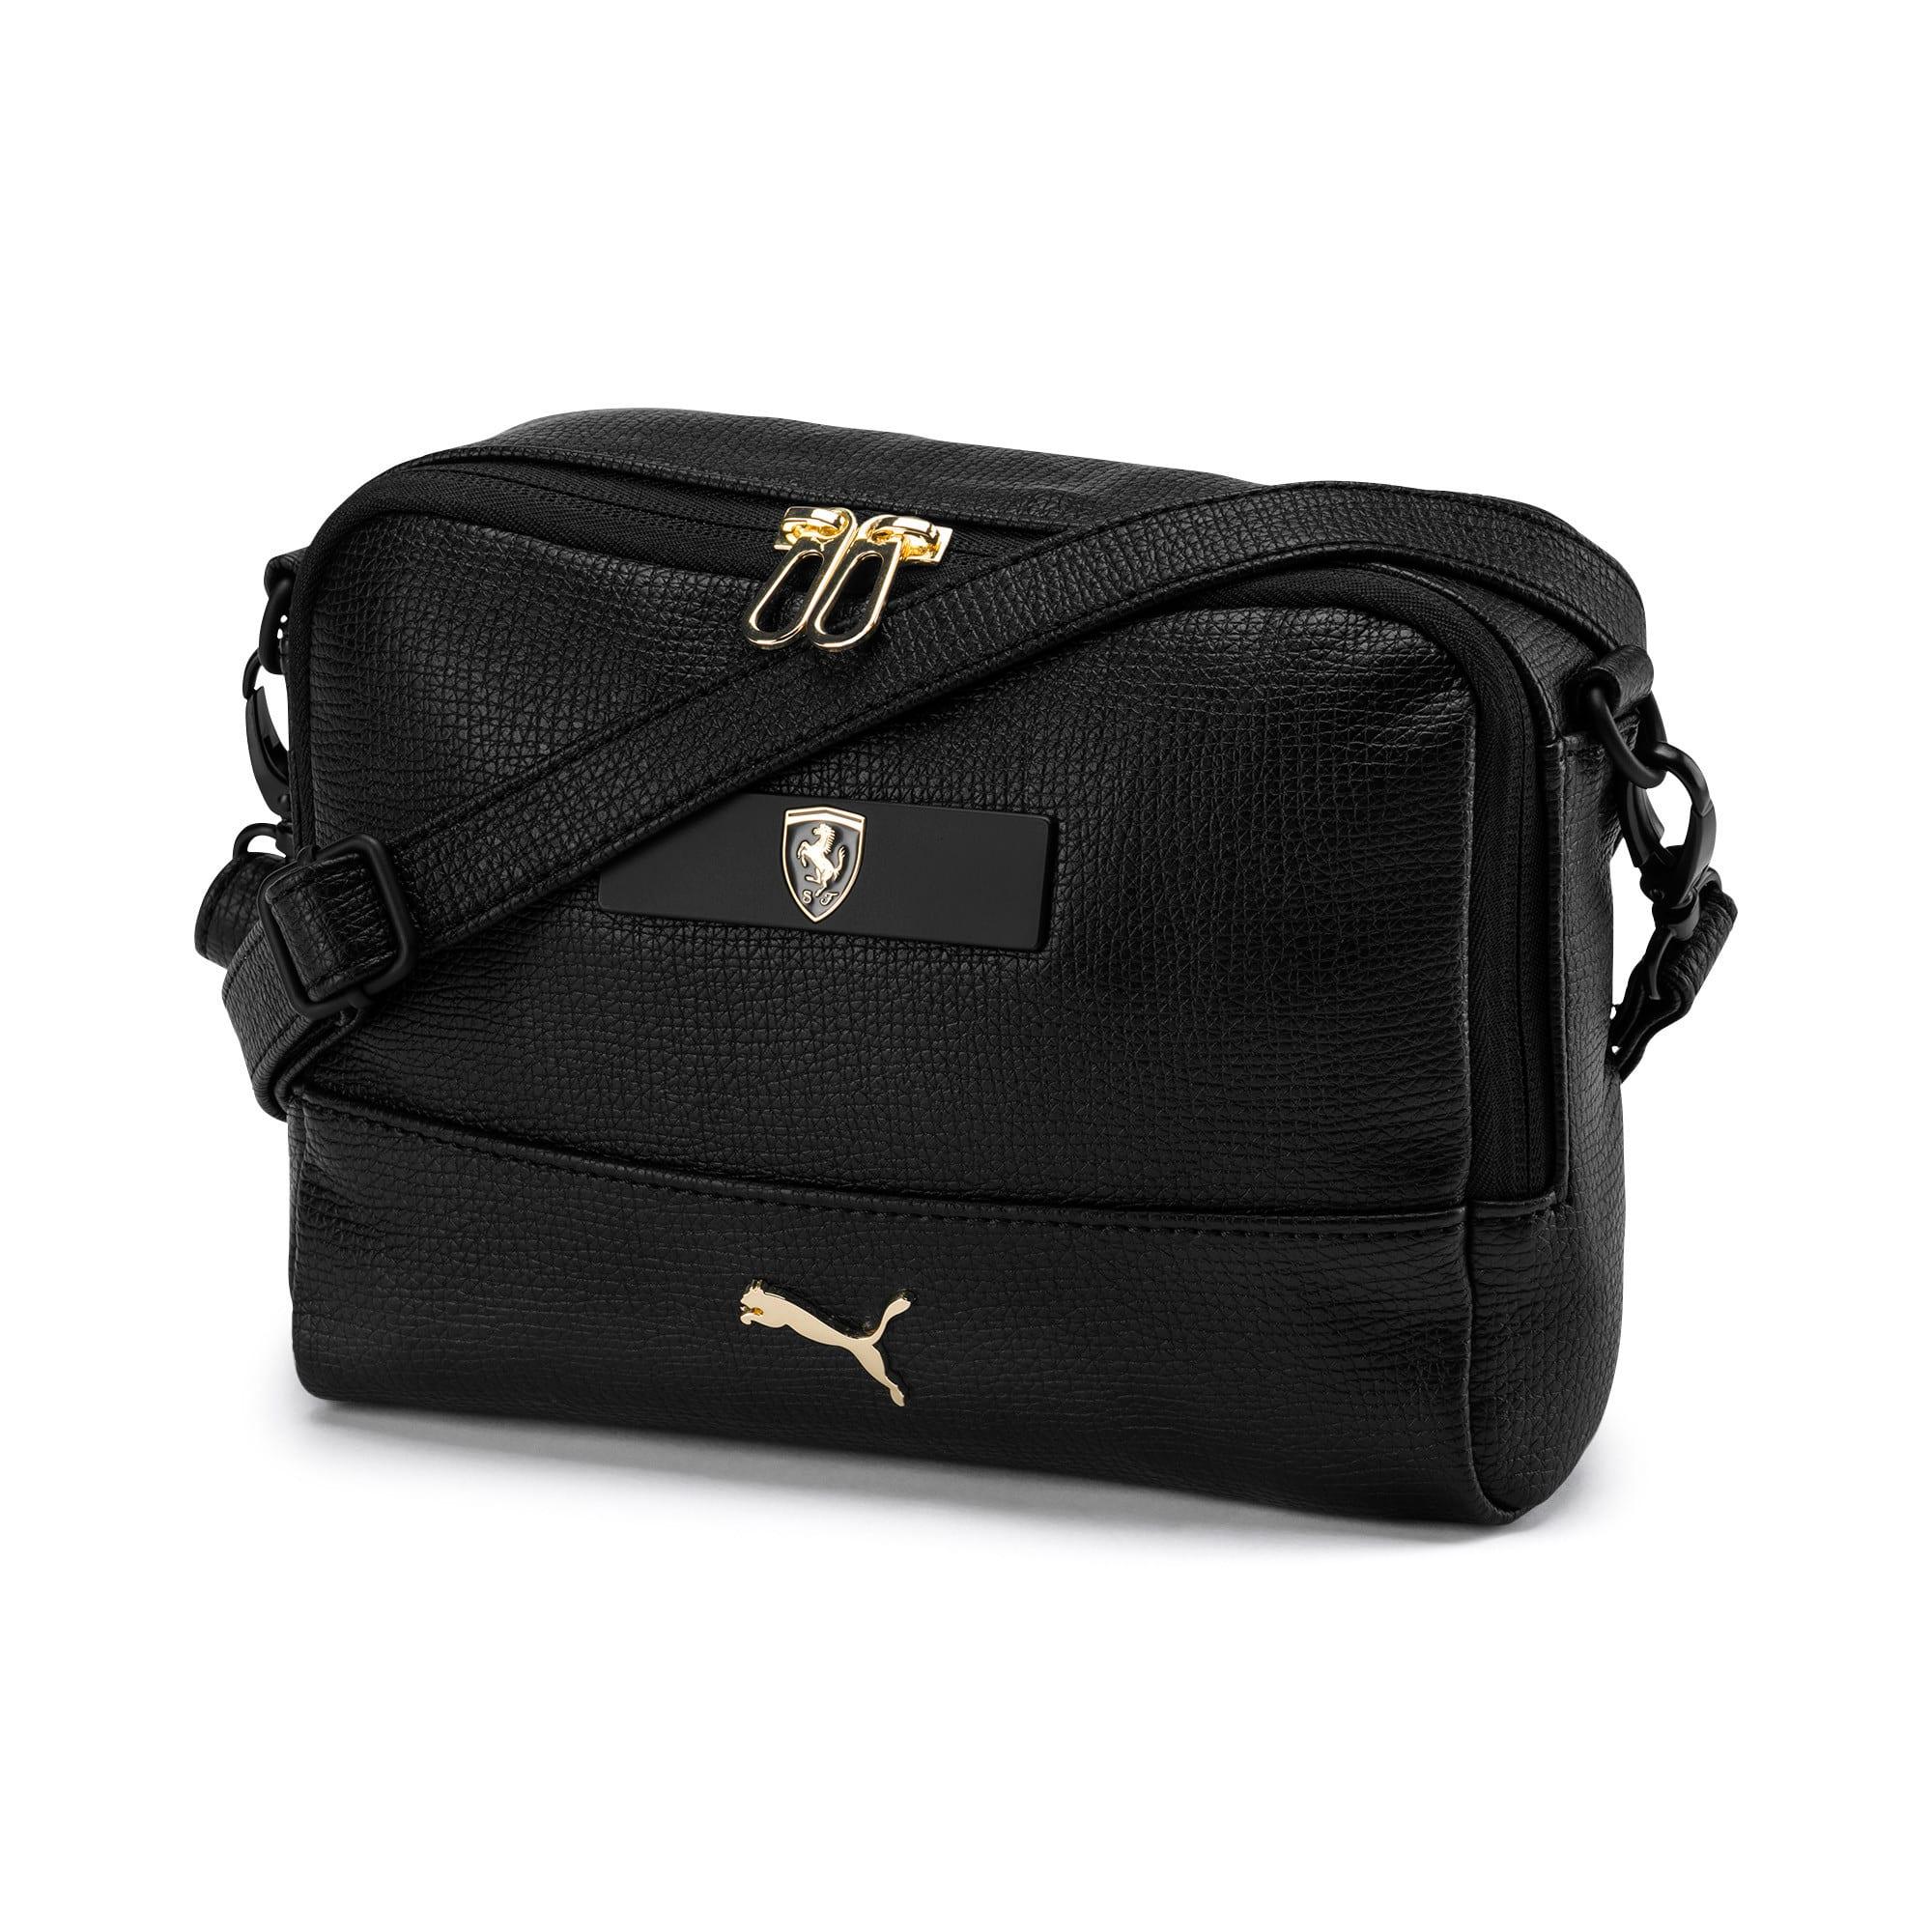 Thumbnail 1 of PUMA x Ferrari Mini Women's handbag, Puma Black, medium-IND